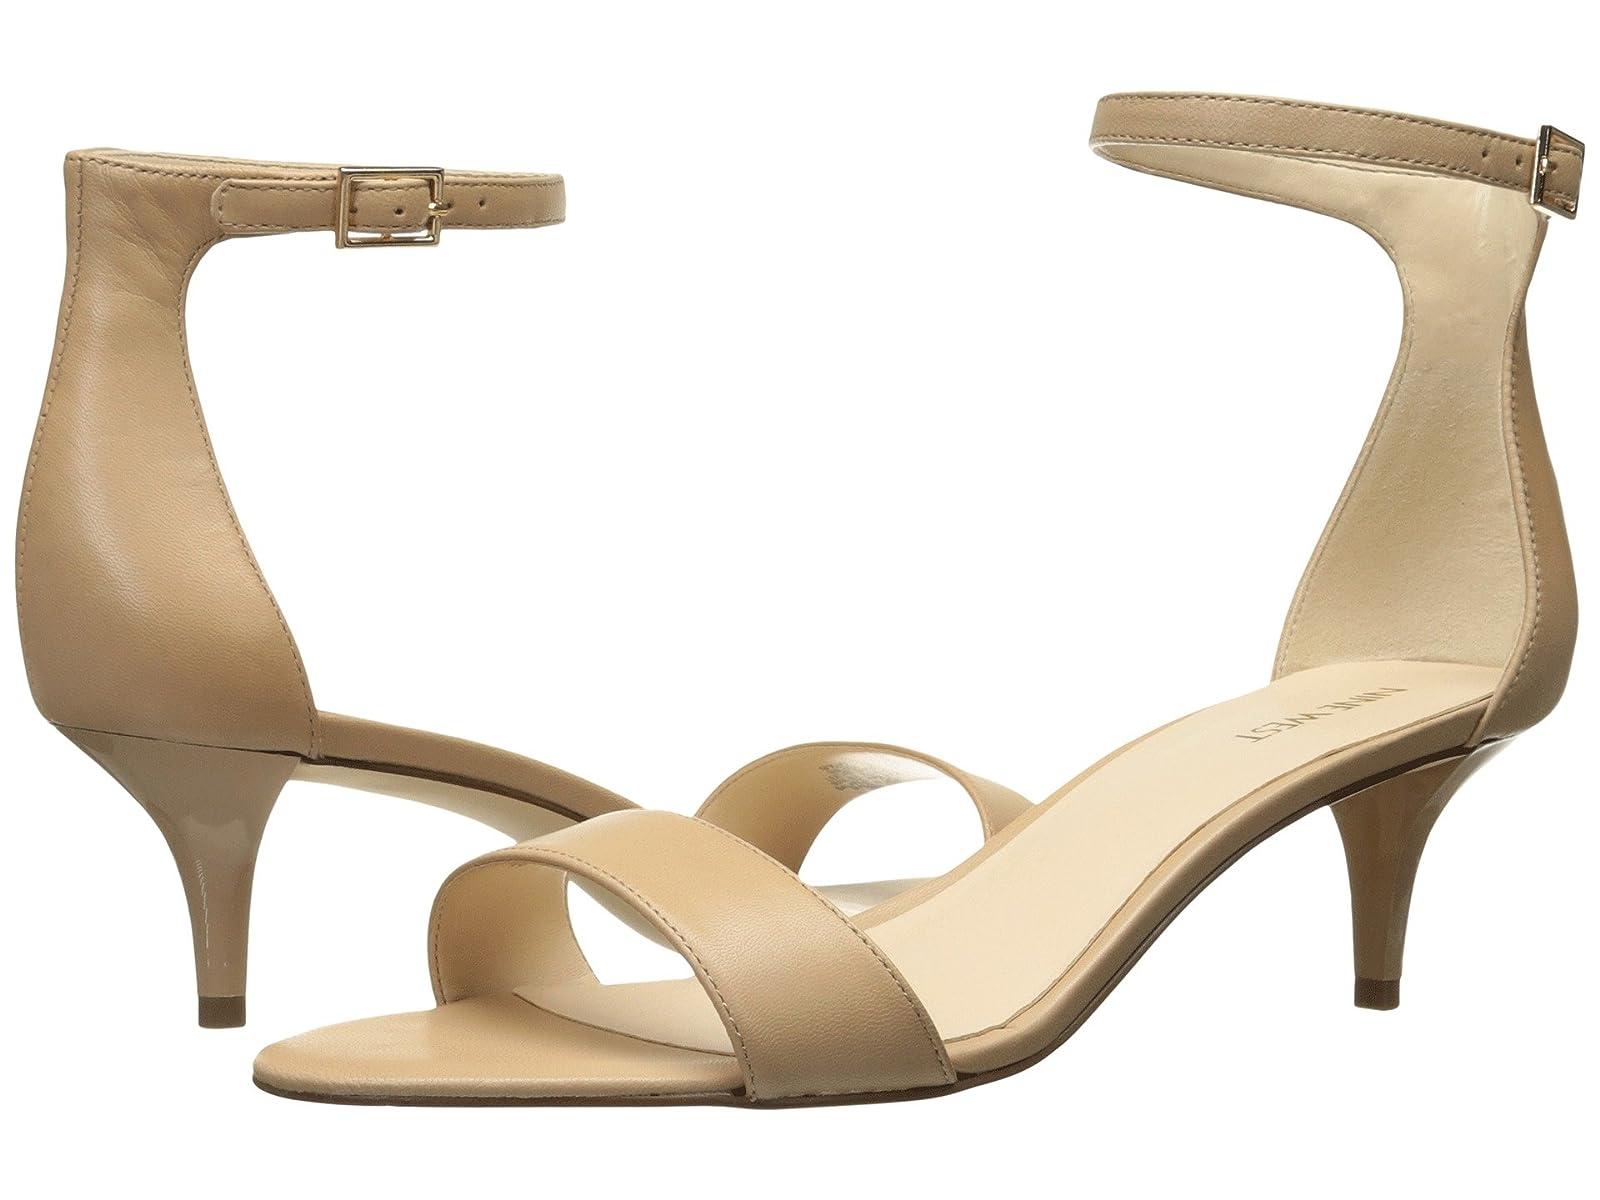 Nine West Leisa Heel SandalAtmospheric grades have affordable shoes